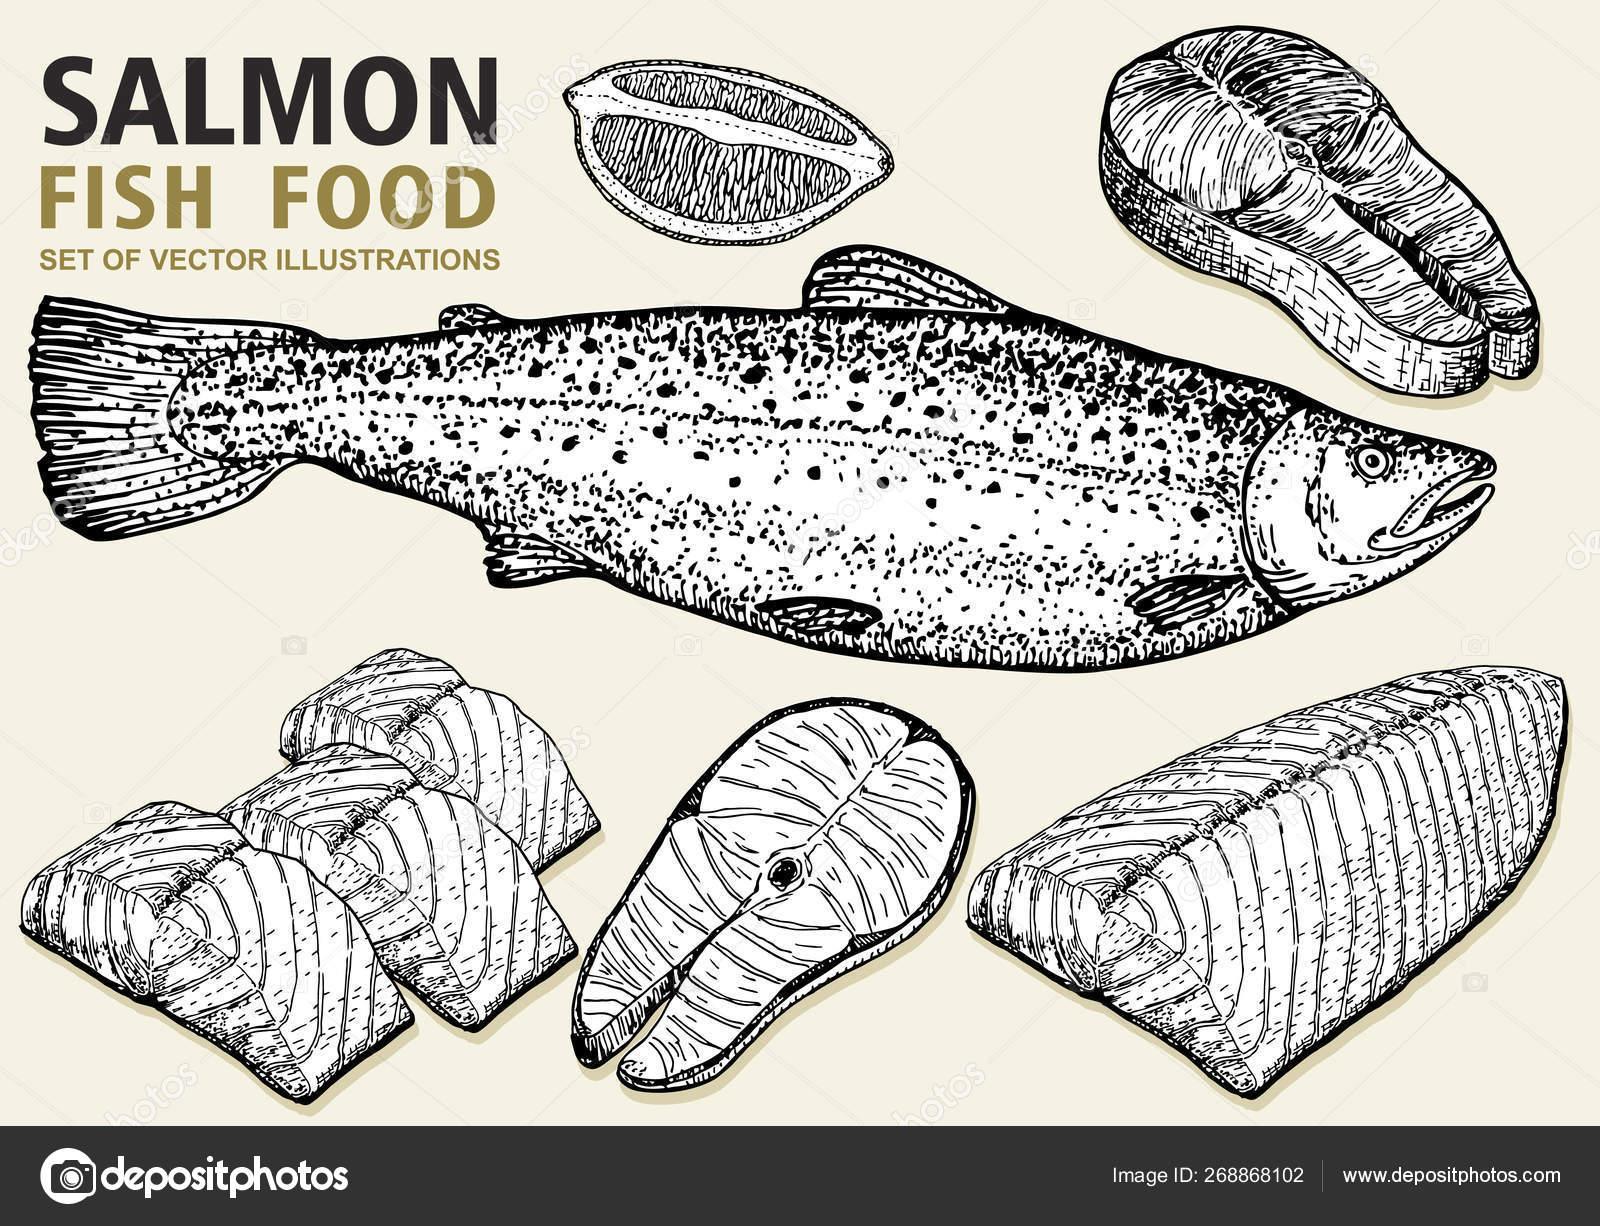 set salmon vector illustration fillet steak fish salmon sketch style stock vector c luisvv 268868102 set salmon vector illustration fillet steak fish salmon sketch style stock vector c luisvv 268868102